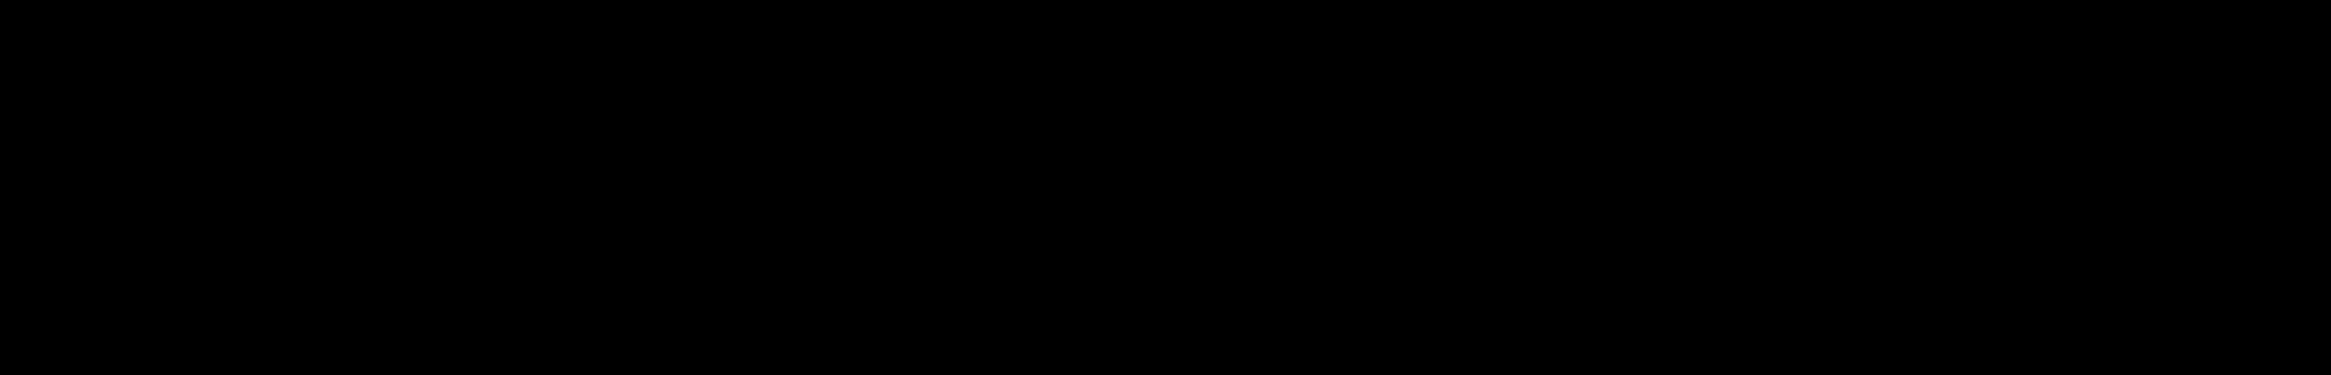 Dolby B Noise Reduction Logo Png Transparent - Dolby Digital Logo